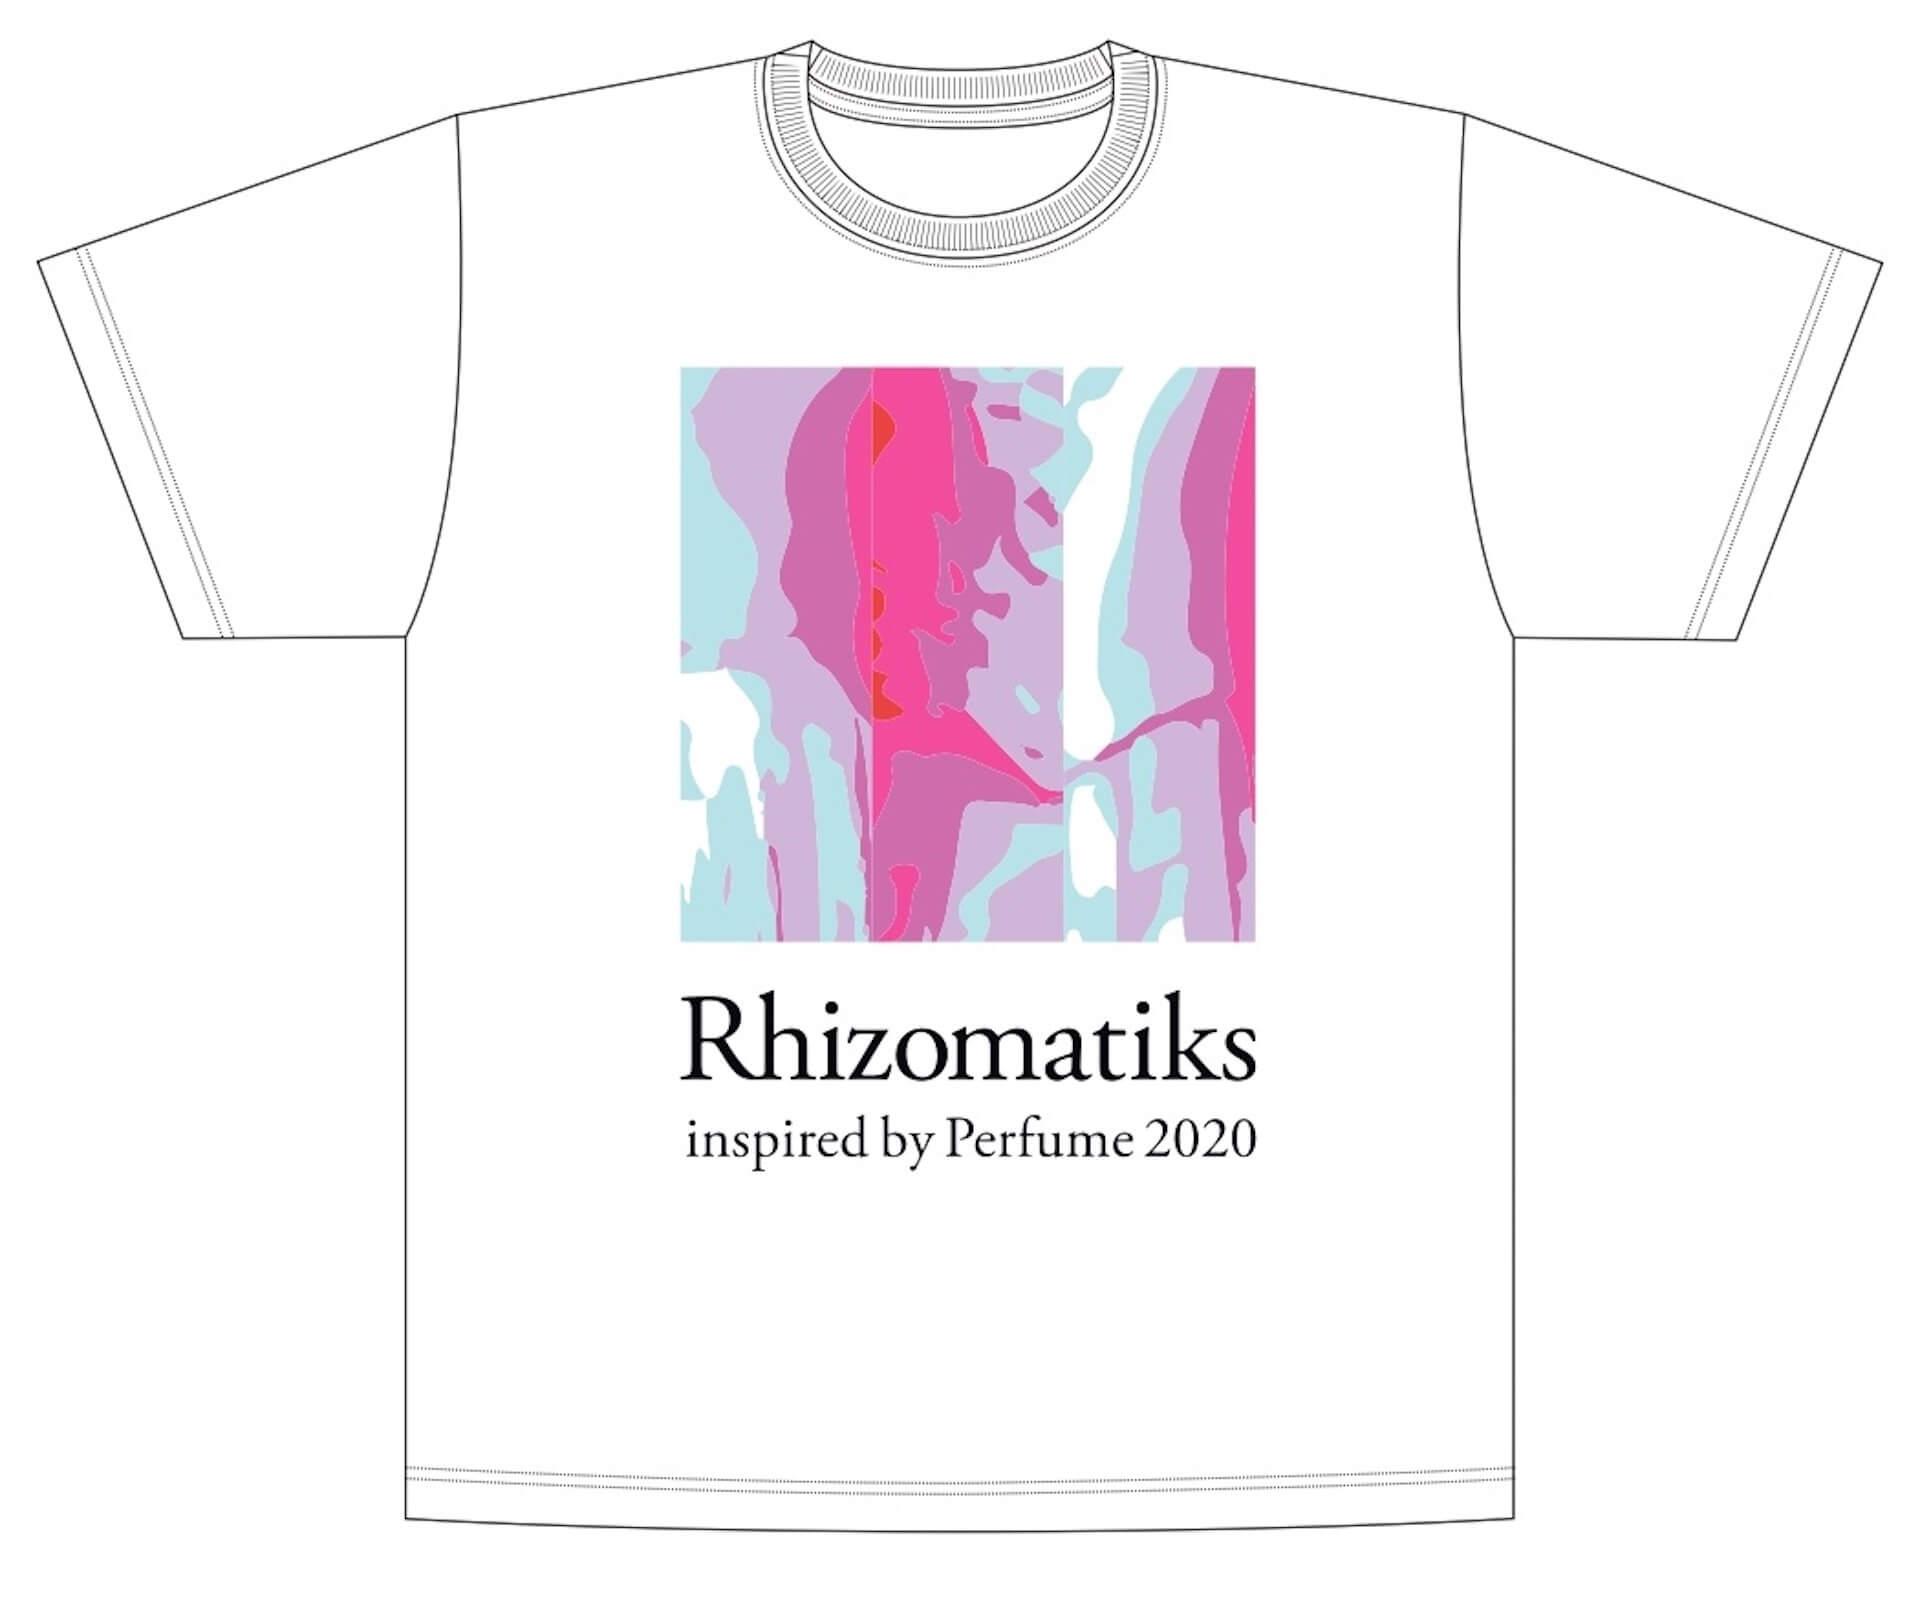 Perfume舞台演出の裏側を体験!<Rhizomatiks inspired by Perfume 2020>が渋谷PARCO MUSEUMで開催! ac200109_rhizomatiksparco_02